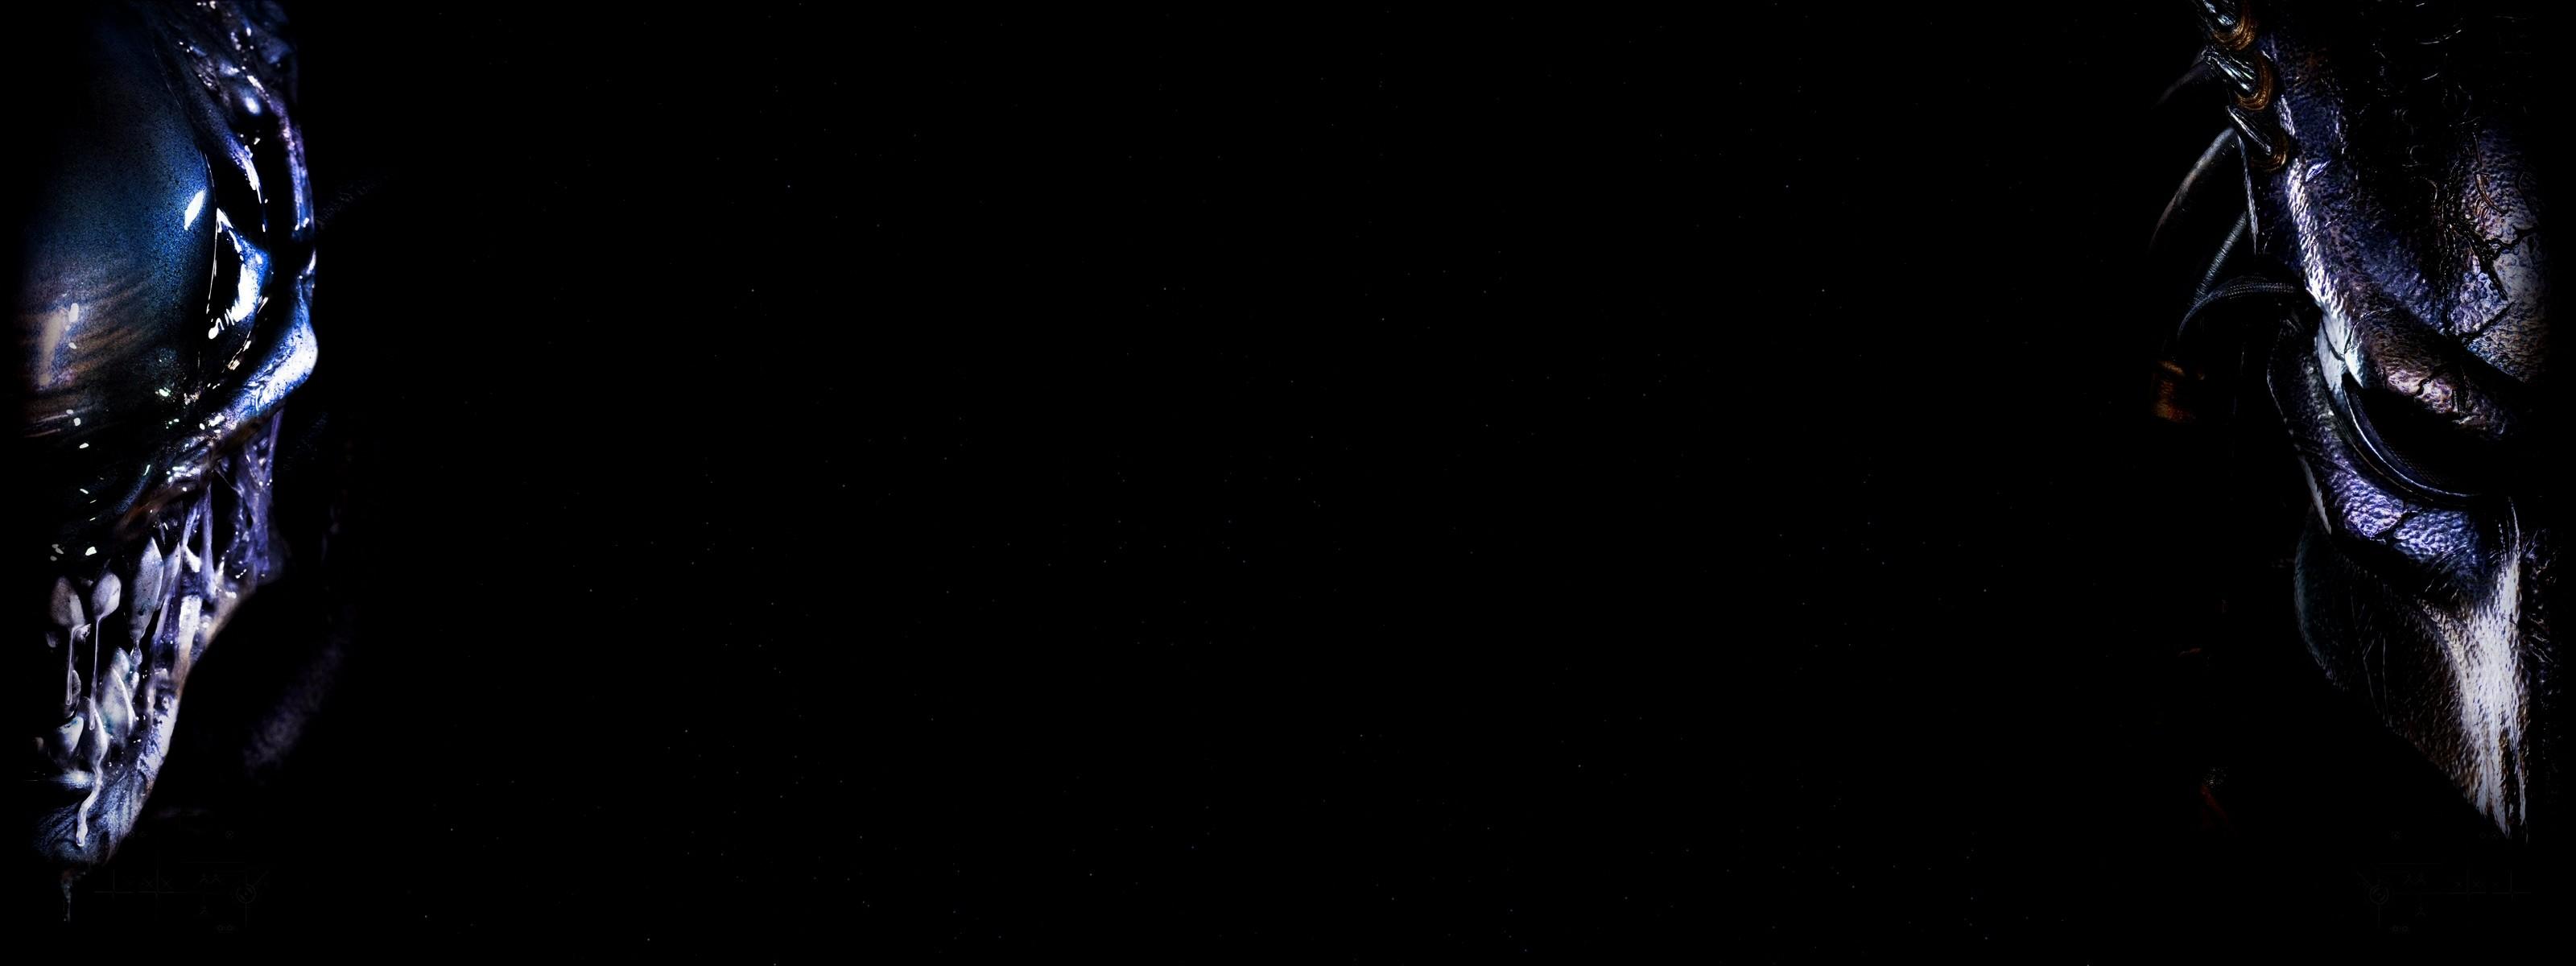 Panoramic Star Wars Wallpaper 3840x1080 (54+ Images